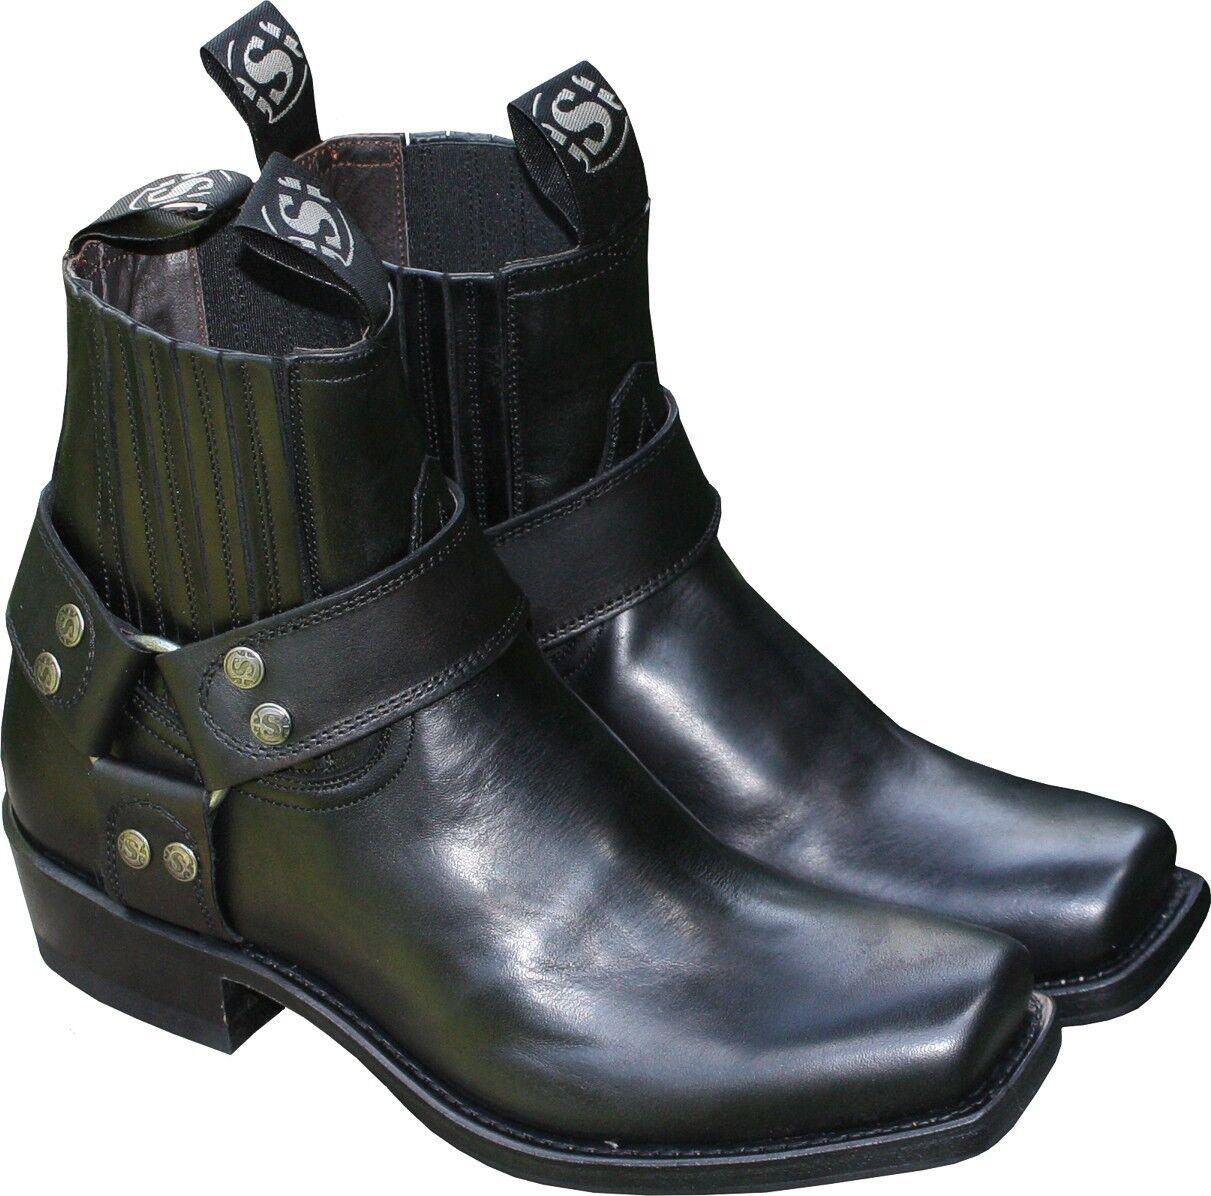 SENDRA Stiefelette Schwarz Ankle Stiefel Schuhe Biker-Stiefel Leder Schwarz Stiefelette Short Cut NEU 9d7eea